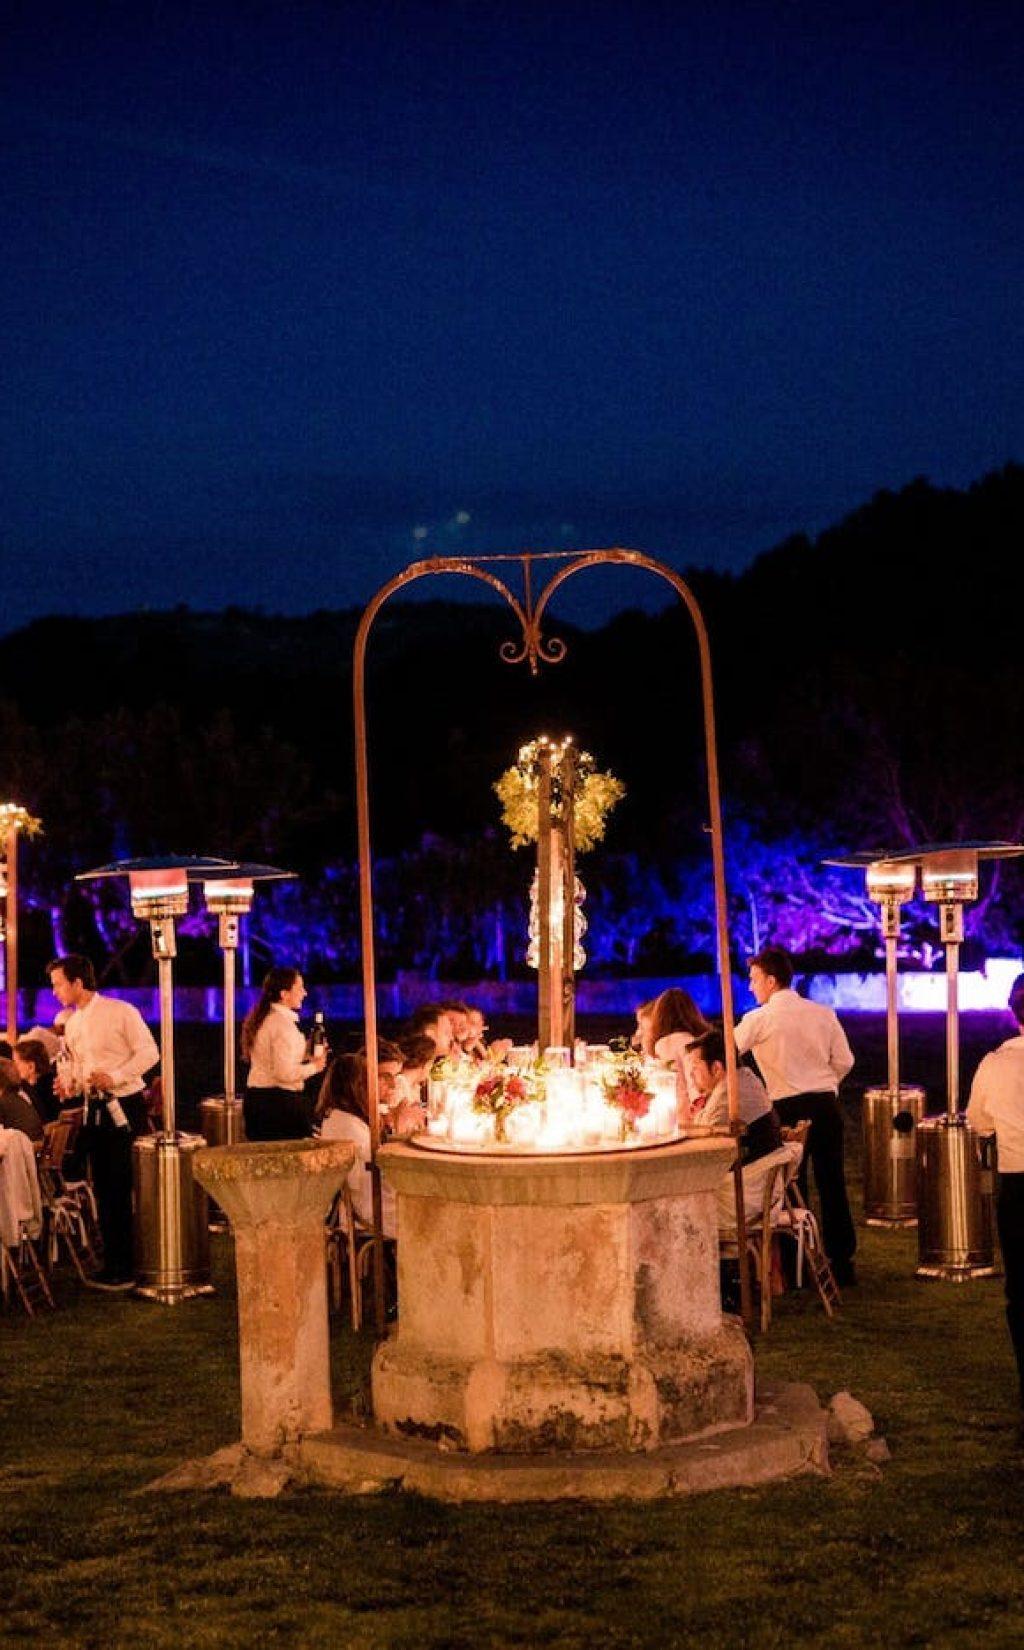 romantic wedding dinner in the Biniorella countryside finca in Mallorca